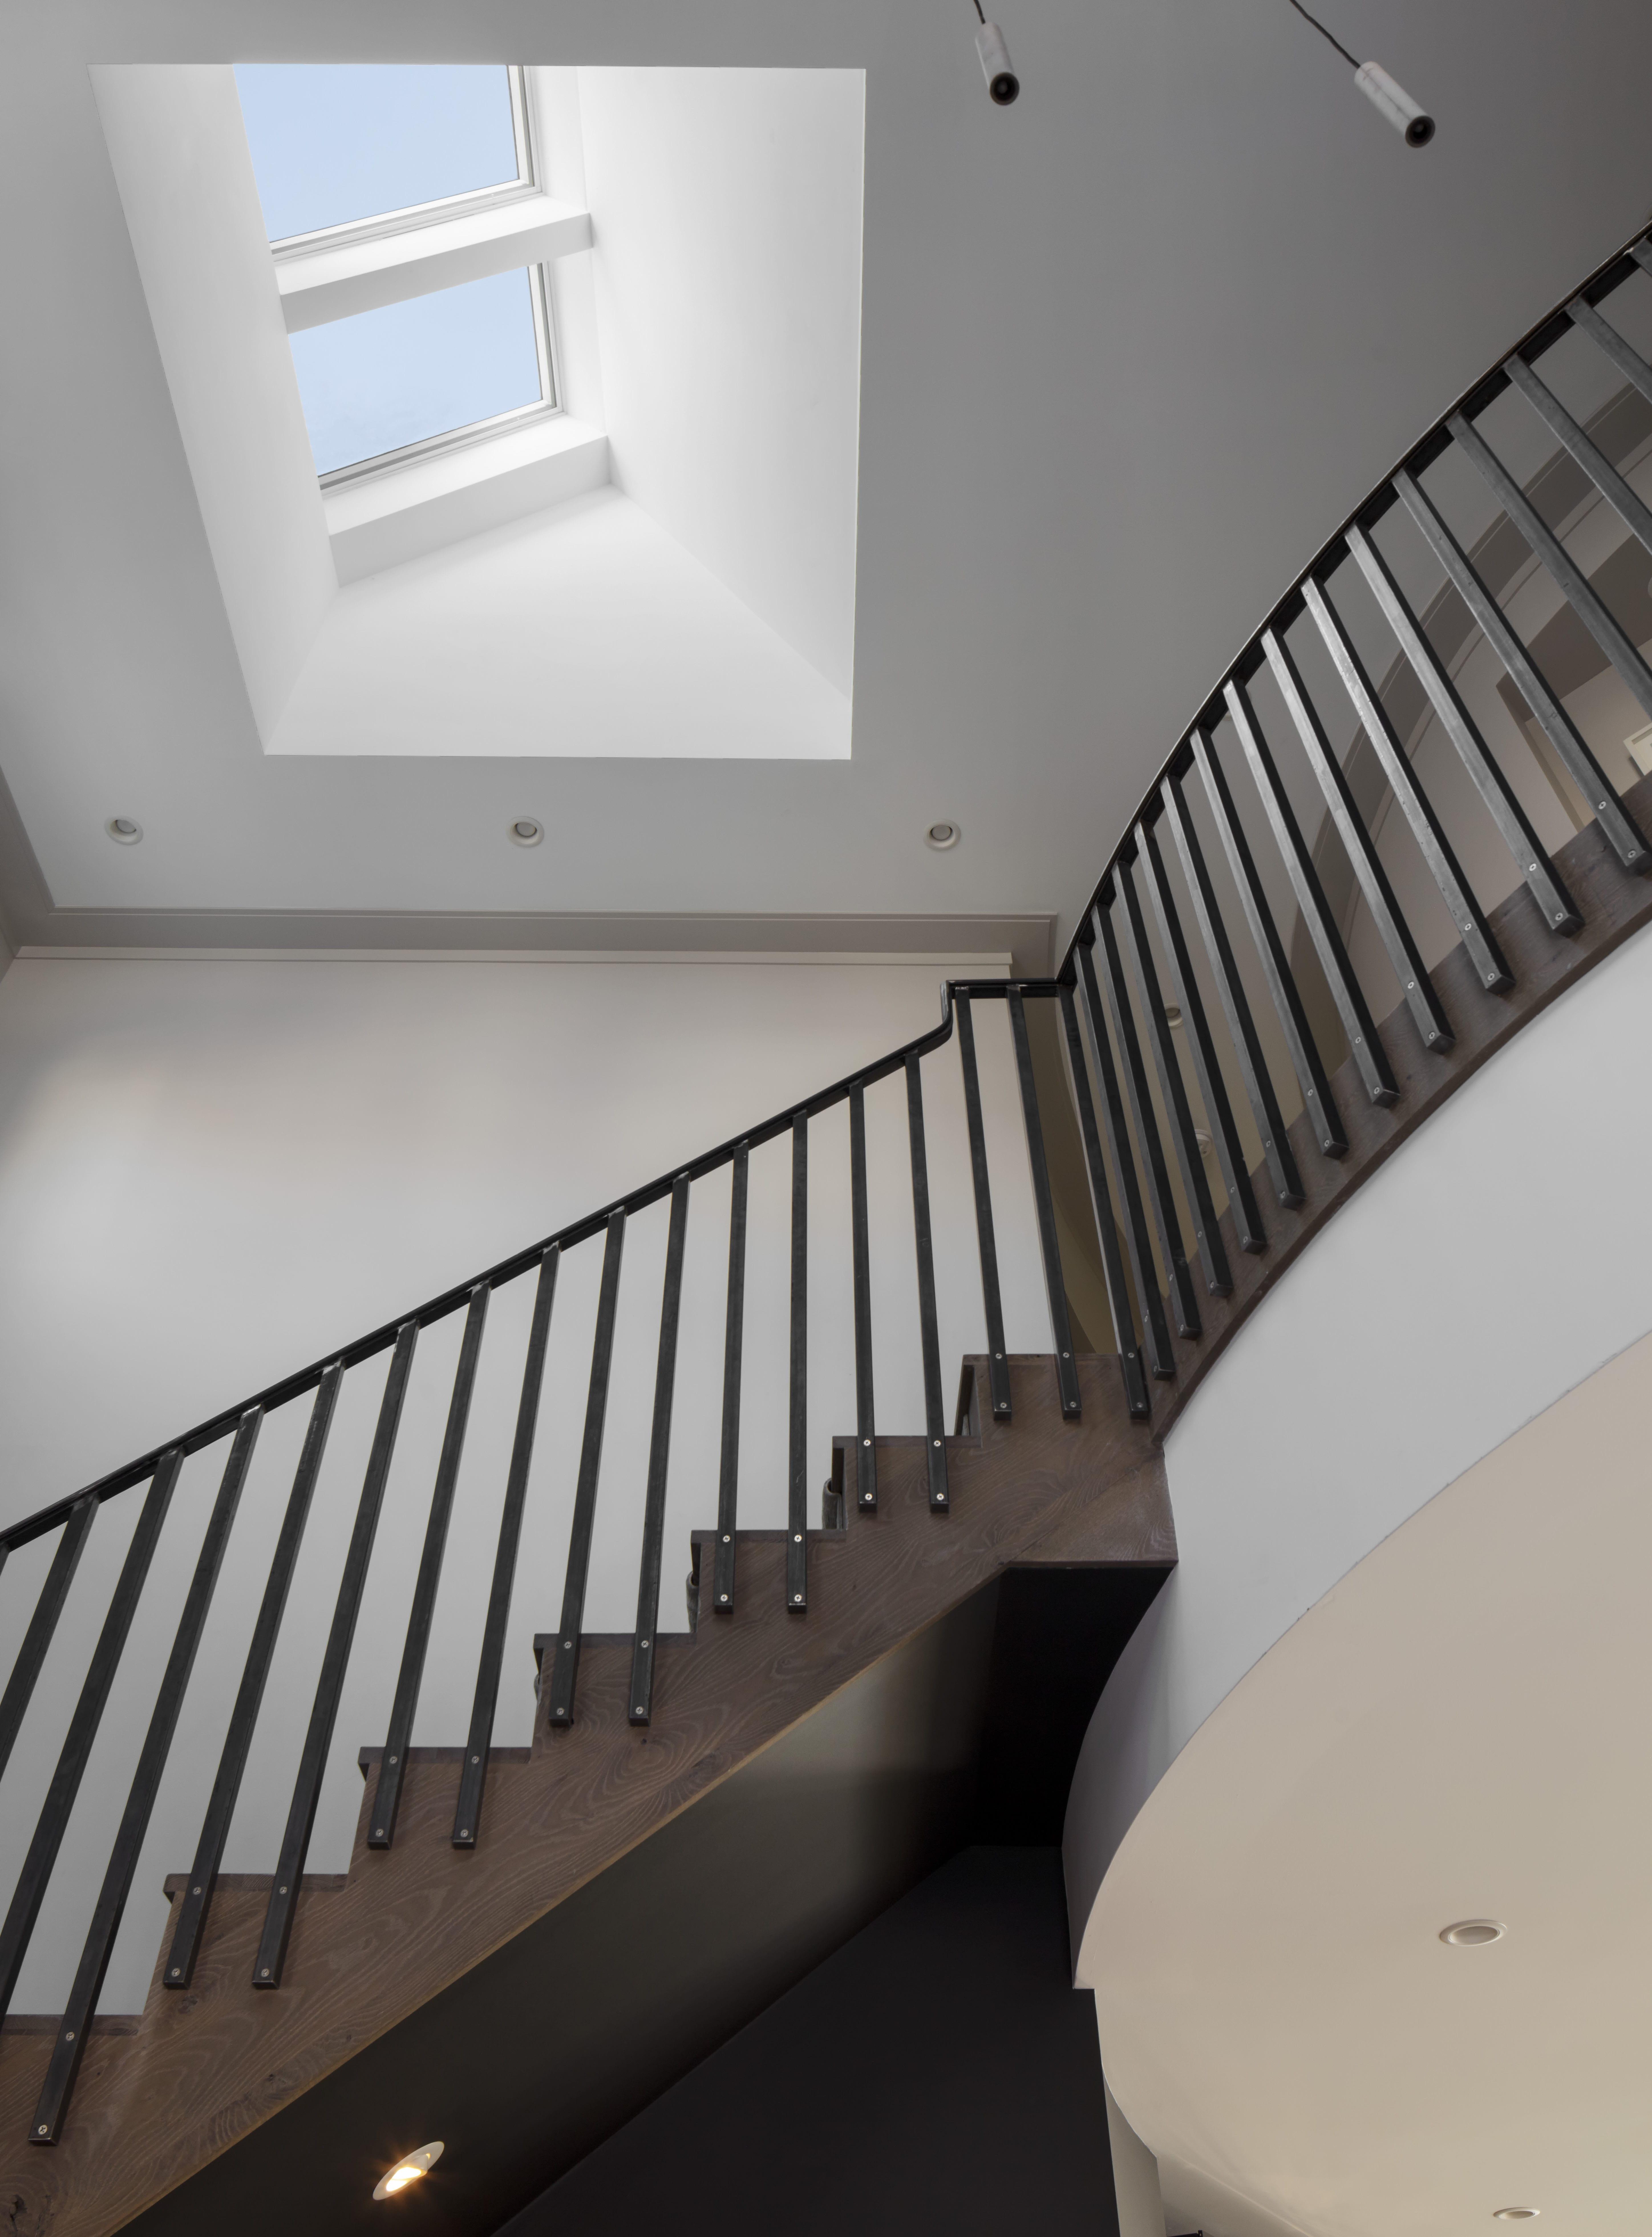 Foyer-stairwell-skylights_feat.jpg#asset:4506